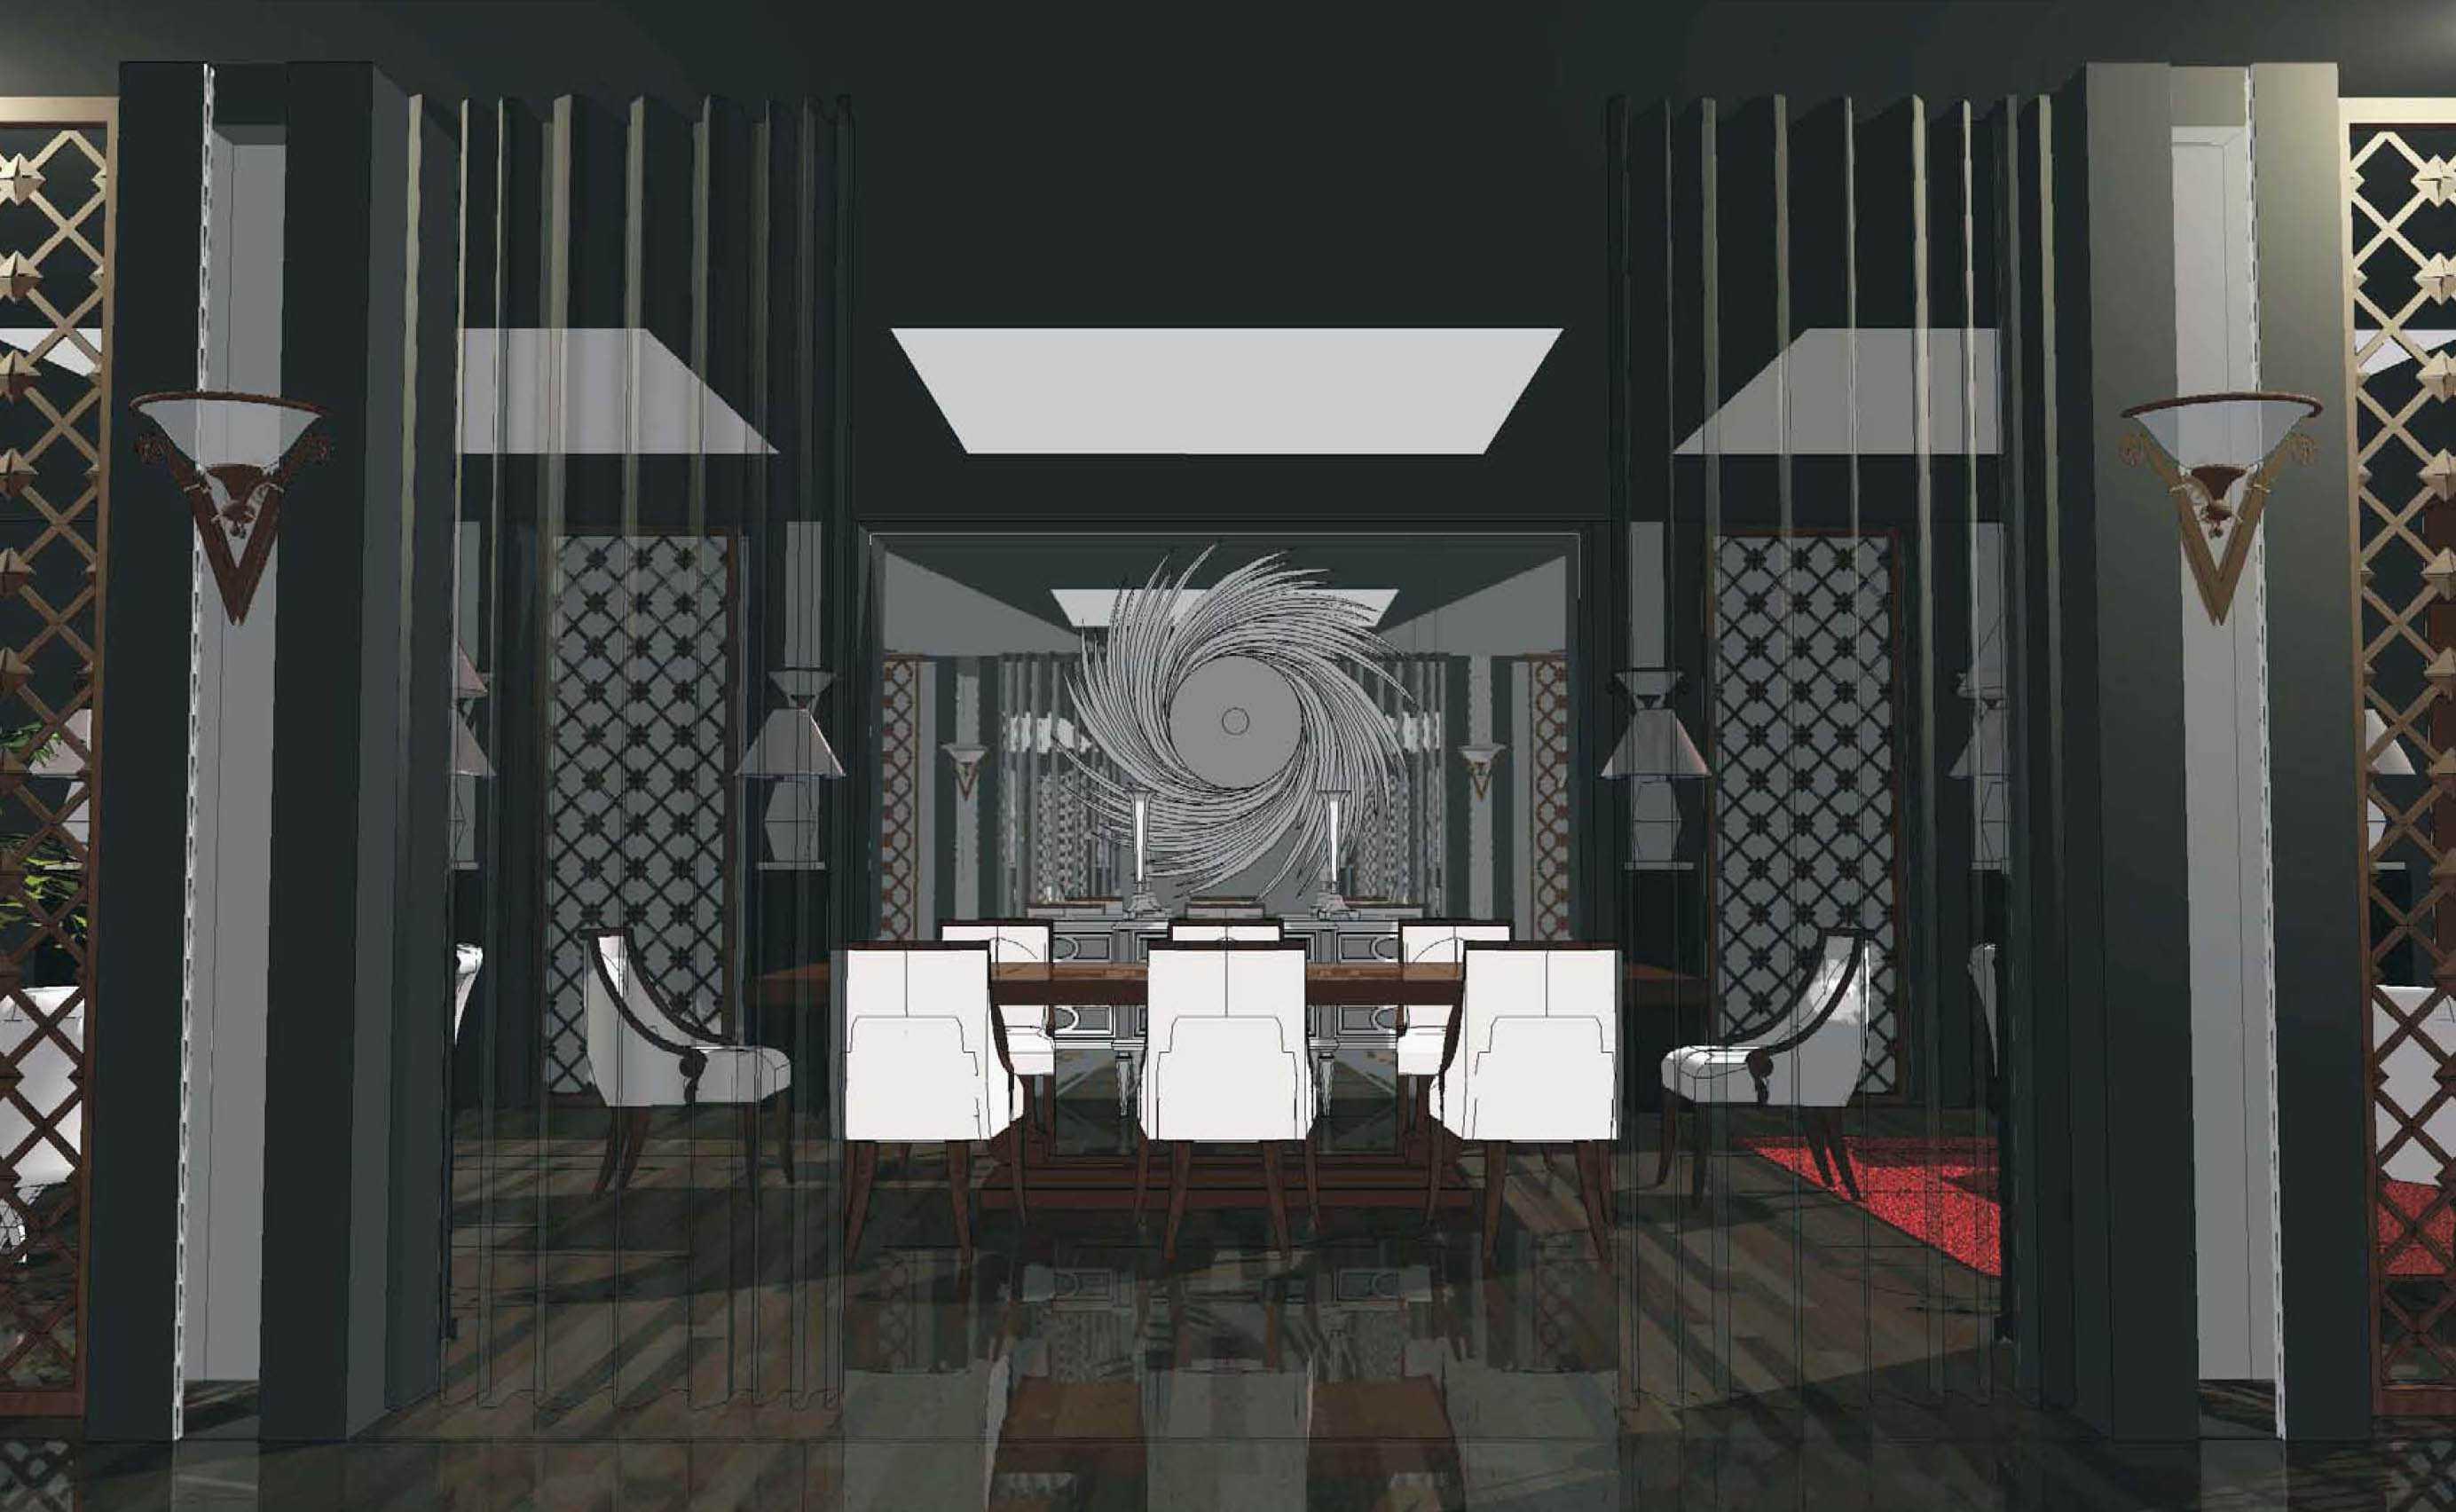 Arsigram Interior Showroom Furniture Daerah Khusus Ibukota Jakarta, Indonesia Daerah Khusus Ibukota Jakarta, Indonesia Meeting Room Klasik  43647